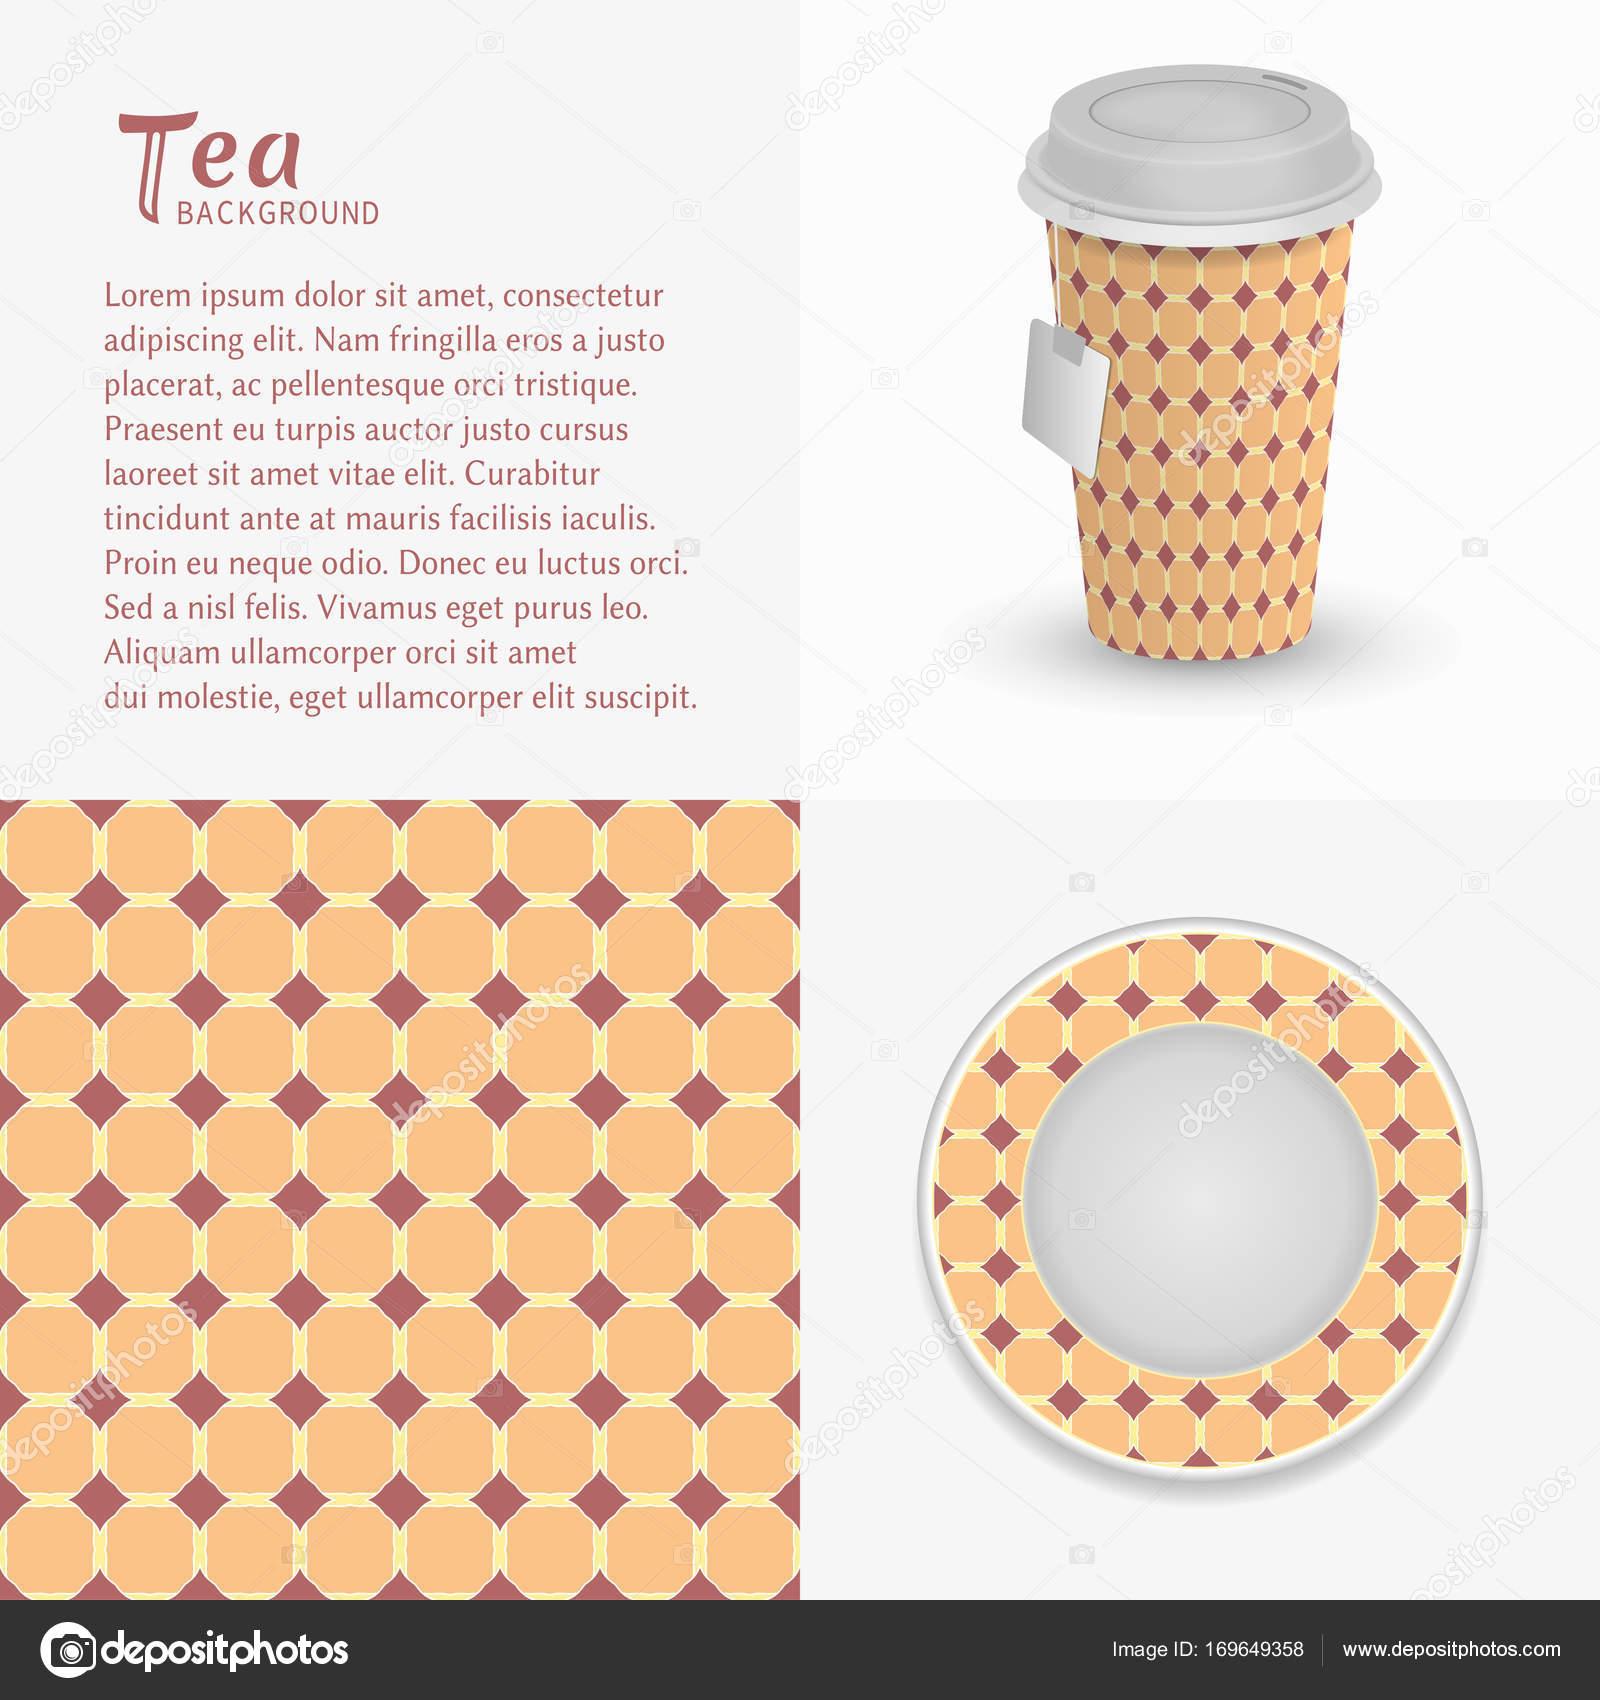 Cardboard Paper Cup Tea Saucer Ornament Seamless Pattern Take Away Stock Vector C Liukas 169649358